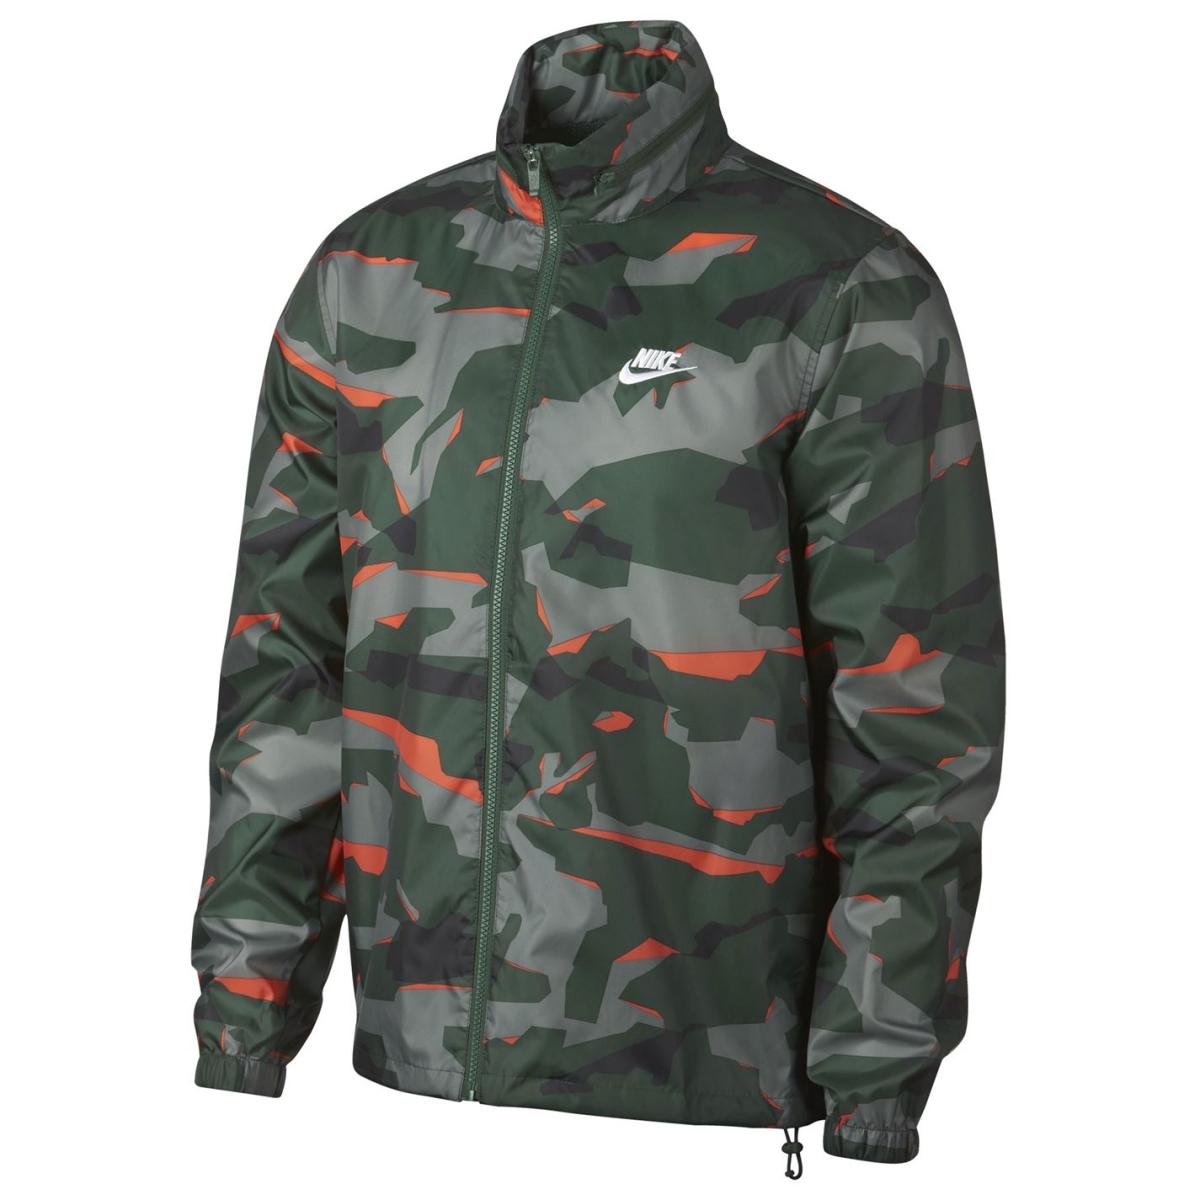 Nike Camo Windjacke Herren Jacke Herrenjacke 1117 Grün_Camo